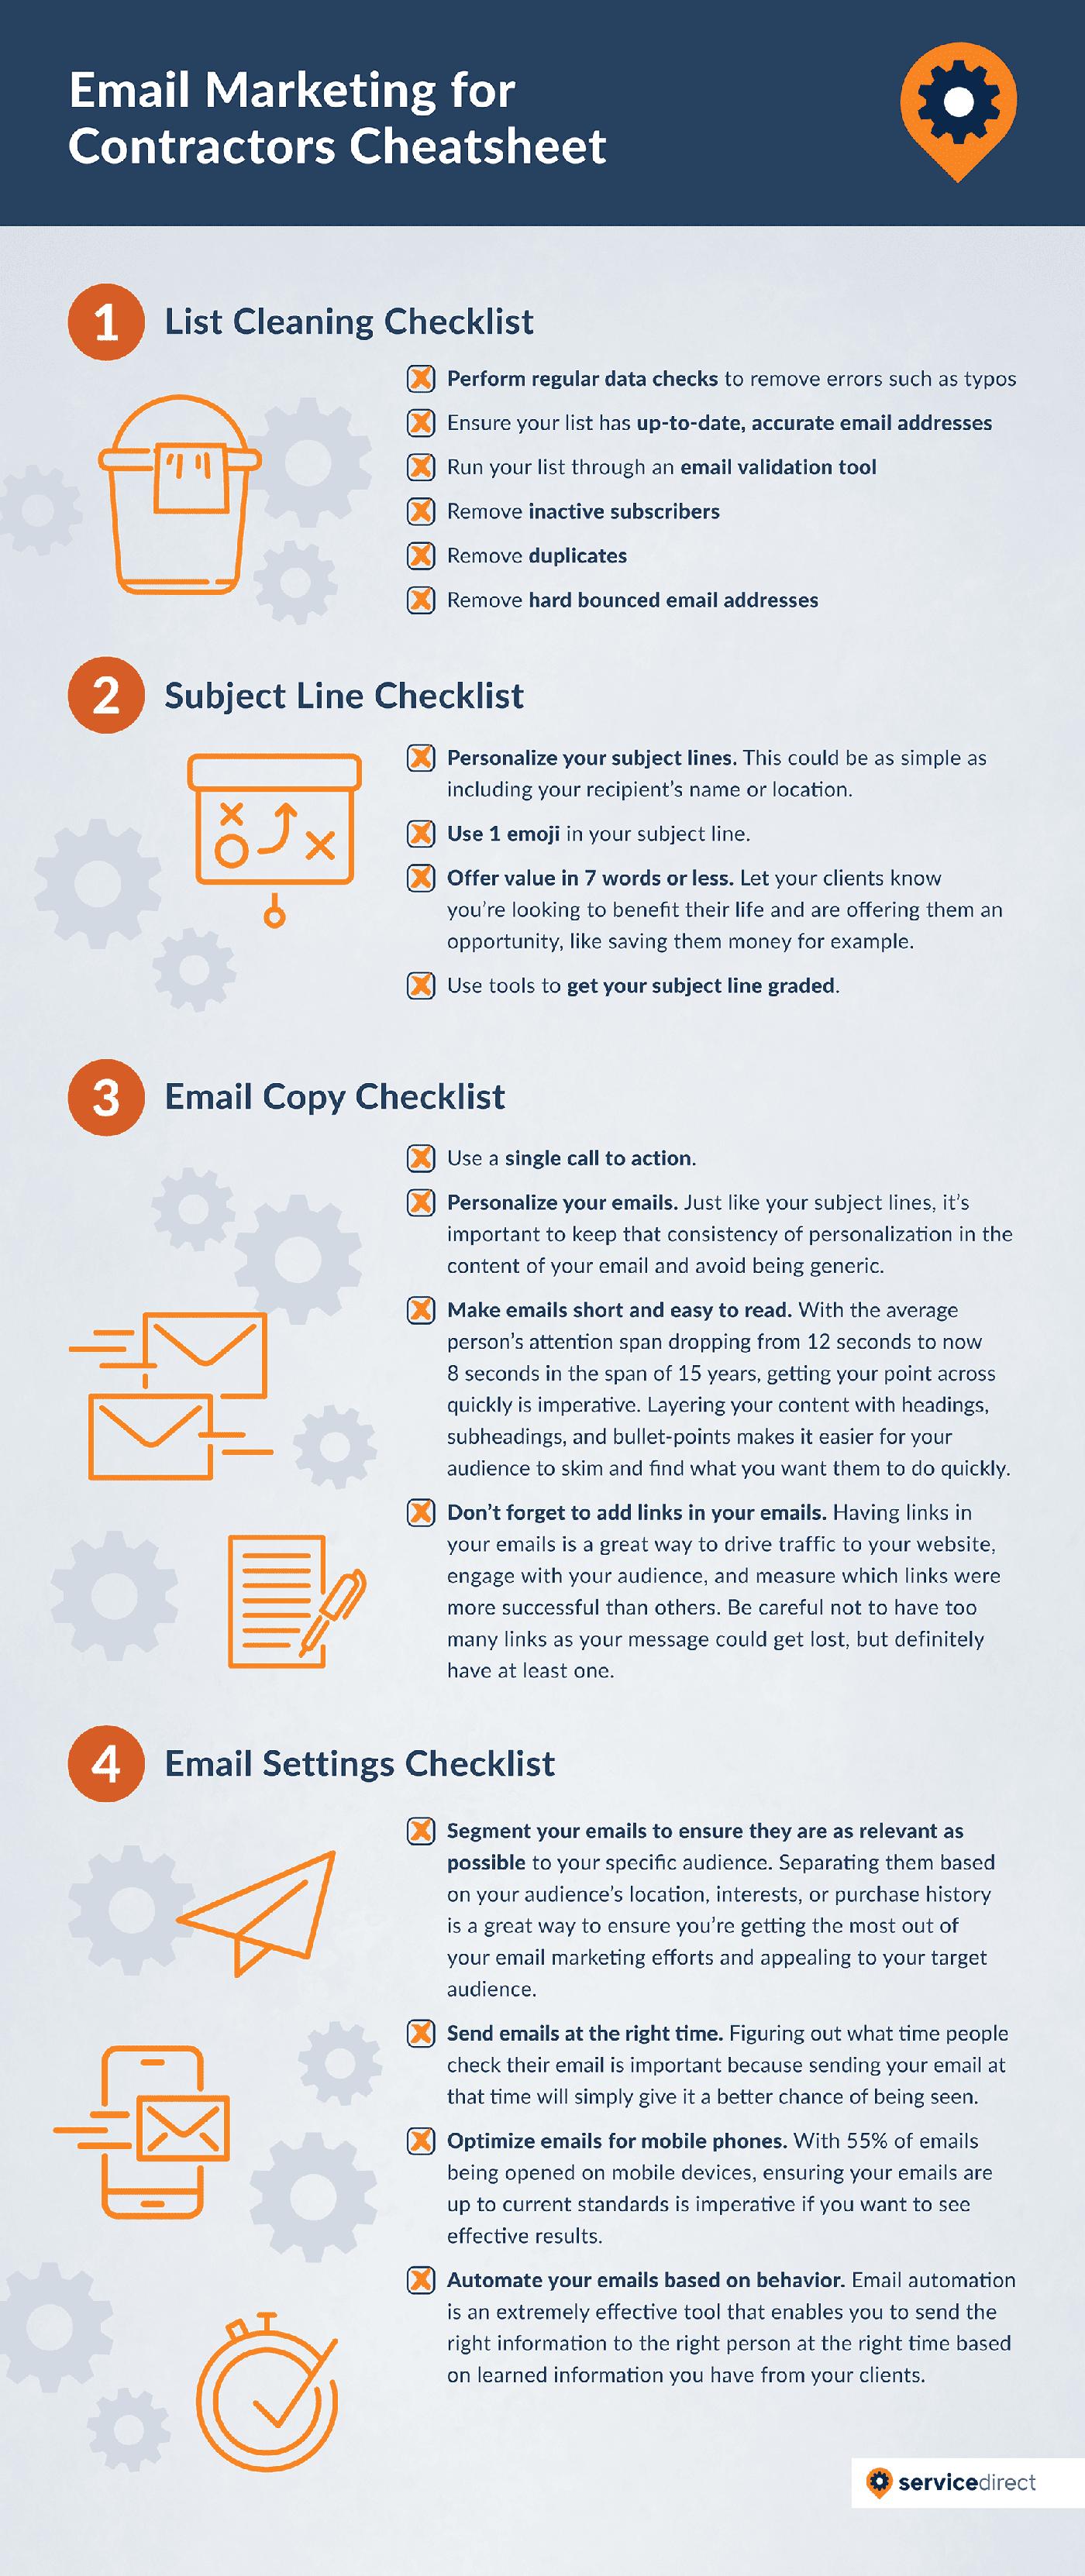 Email Marketing For Contractors Cheatsheet